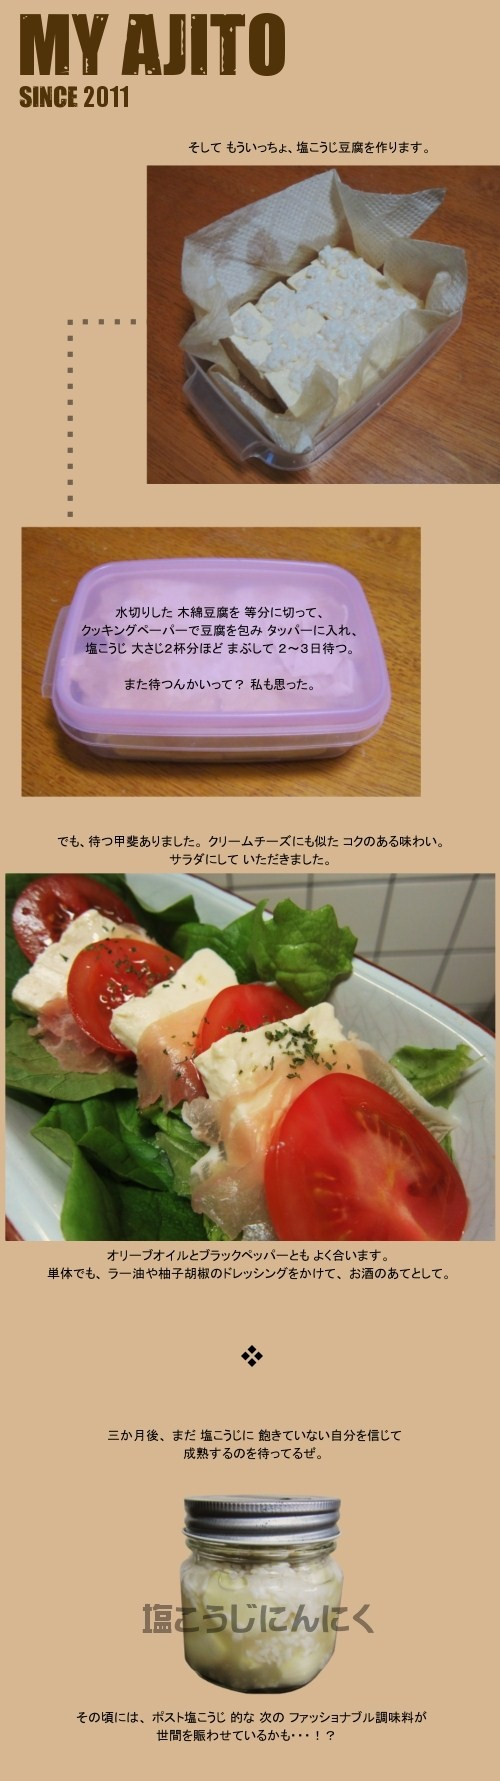 shioko_4.jpg